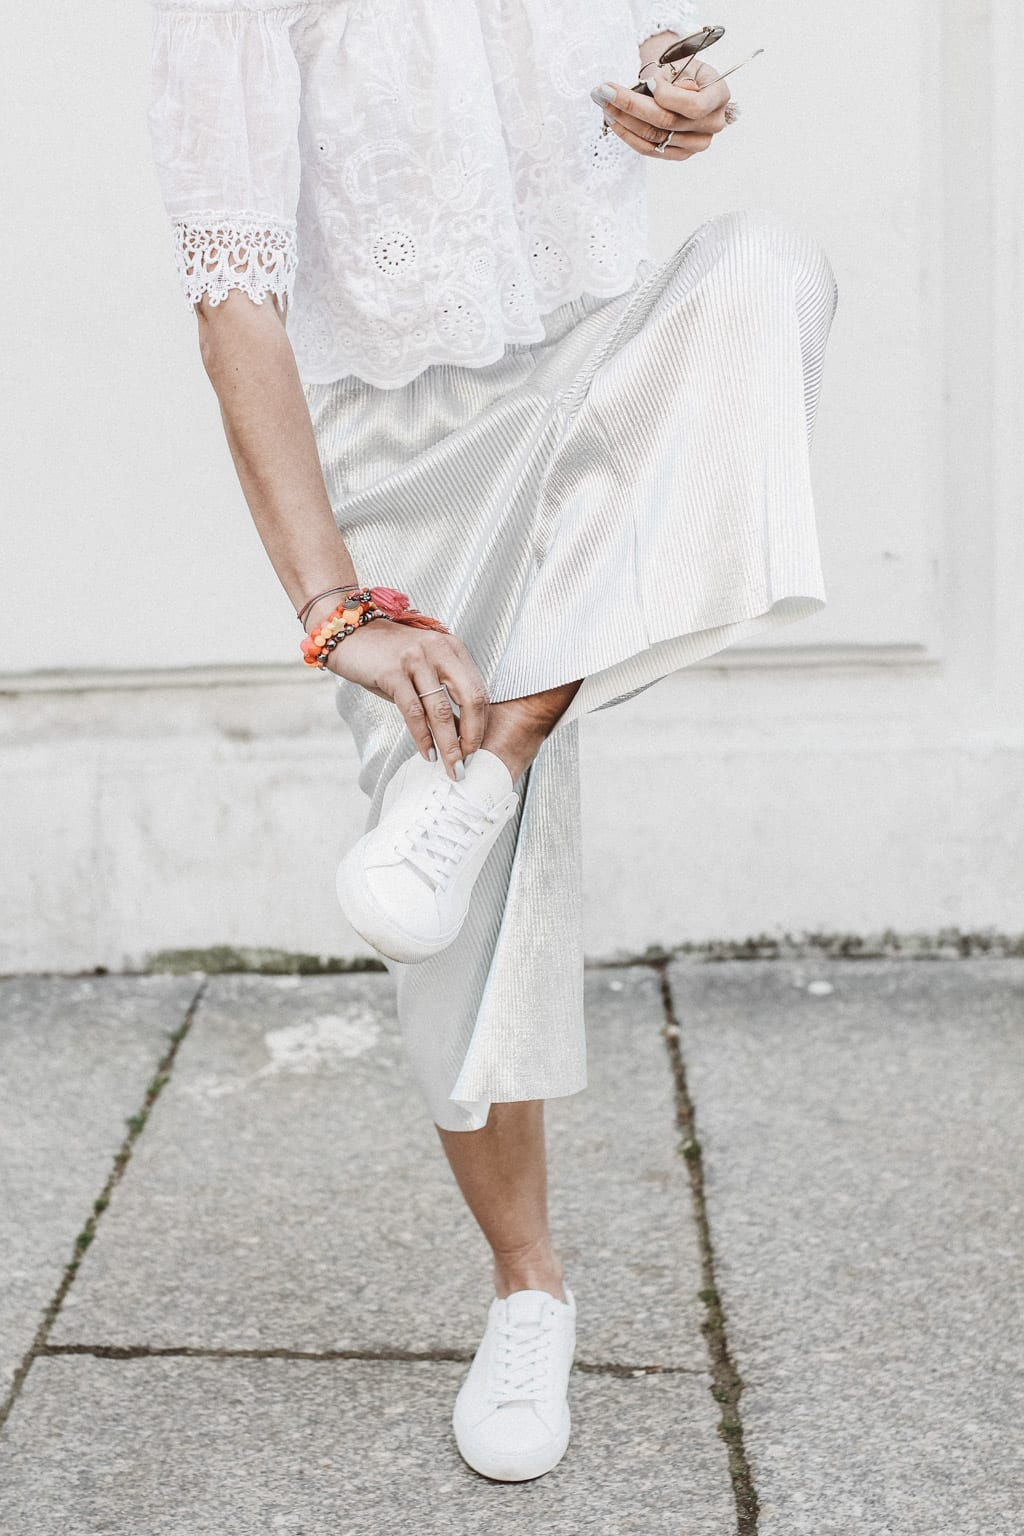 CK160511_Constantly-K-Karin-Kaswurm-Model-Spring-Street-Style-Fashion-Summer-Culotter-Silver-7008